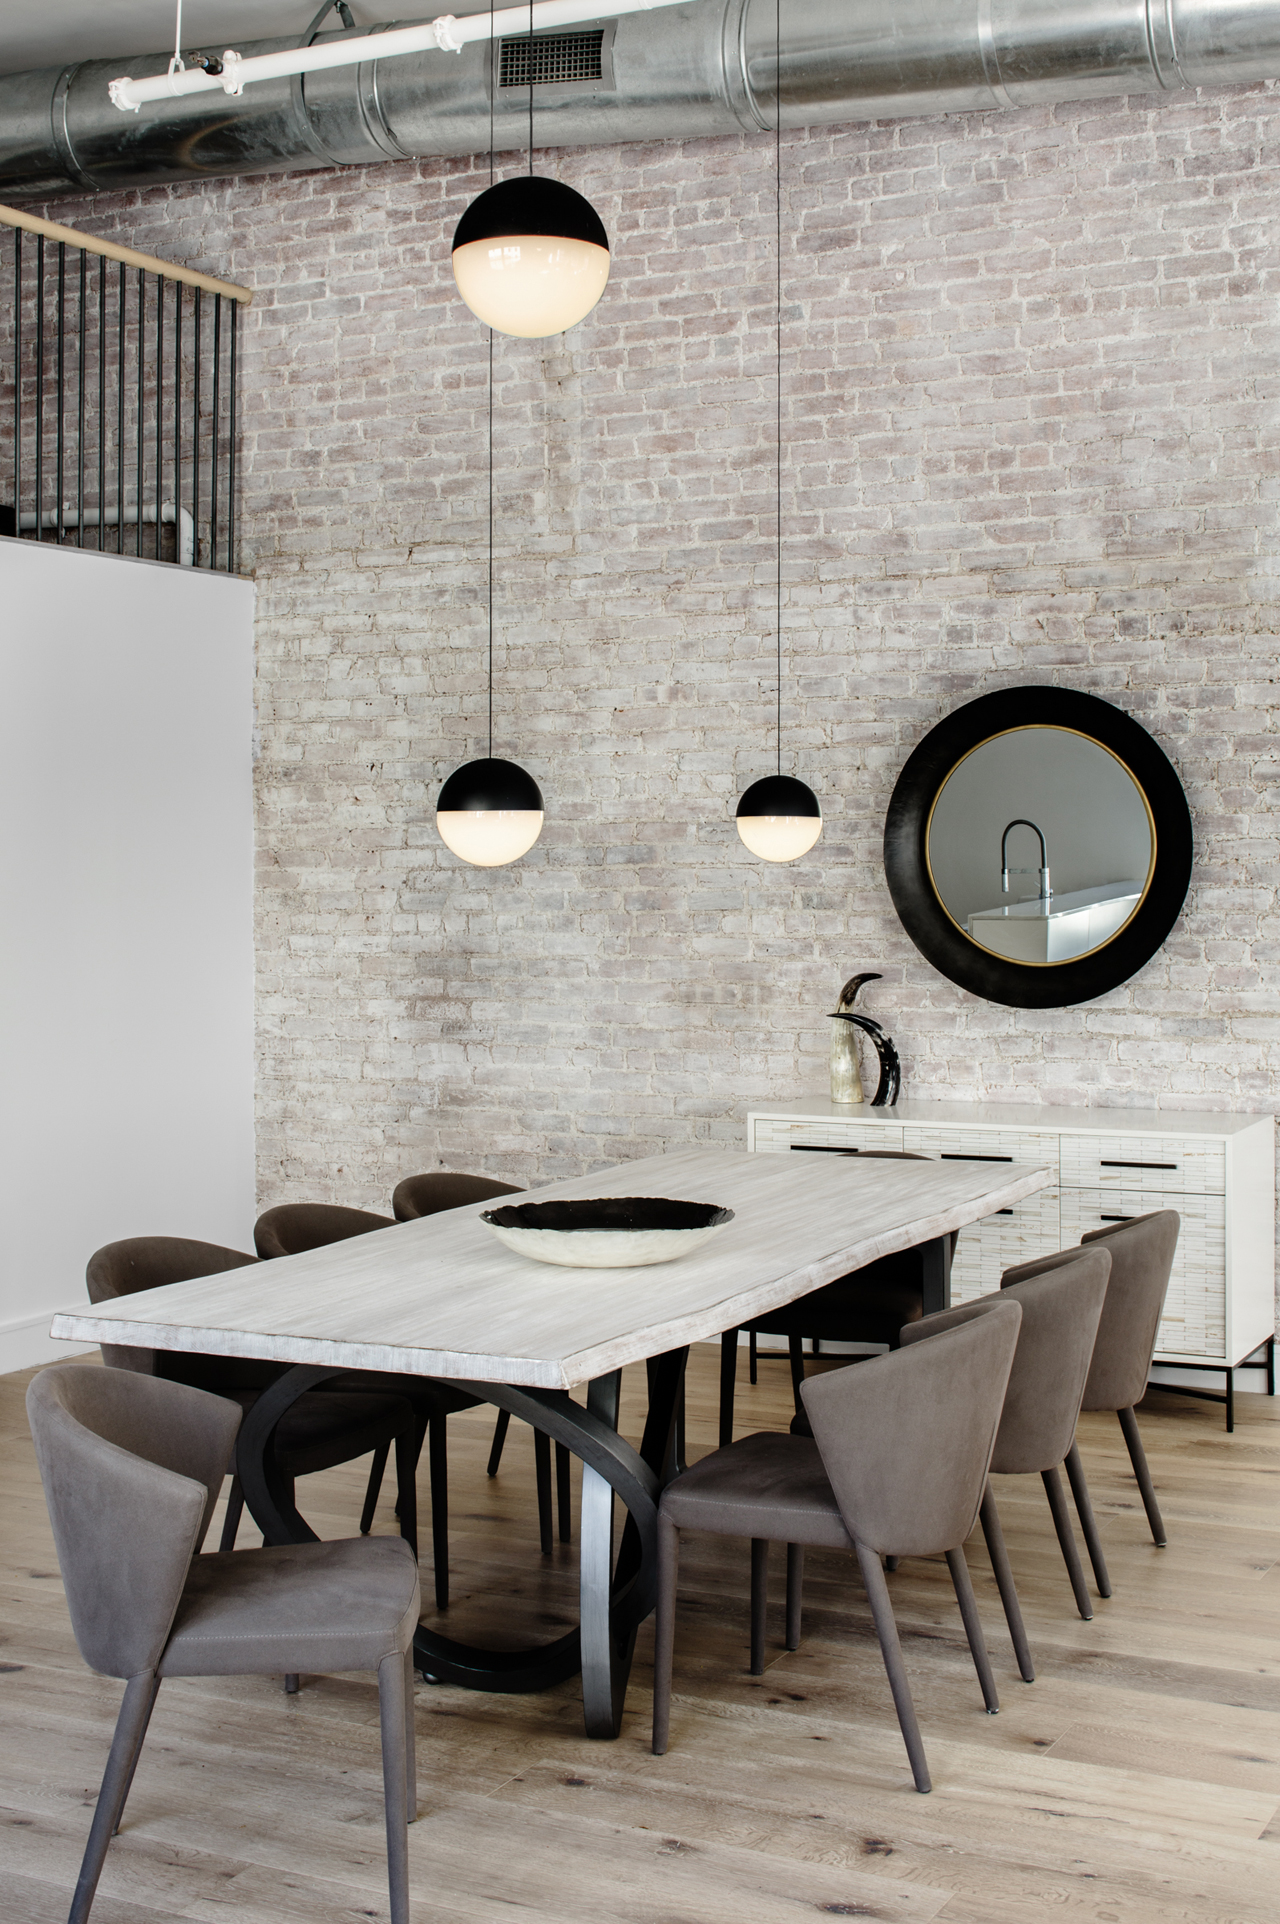 Industrial Dining Room Lighting Designs Shine in a New York Loft (1)